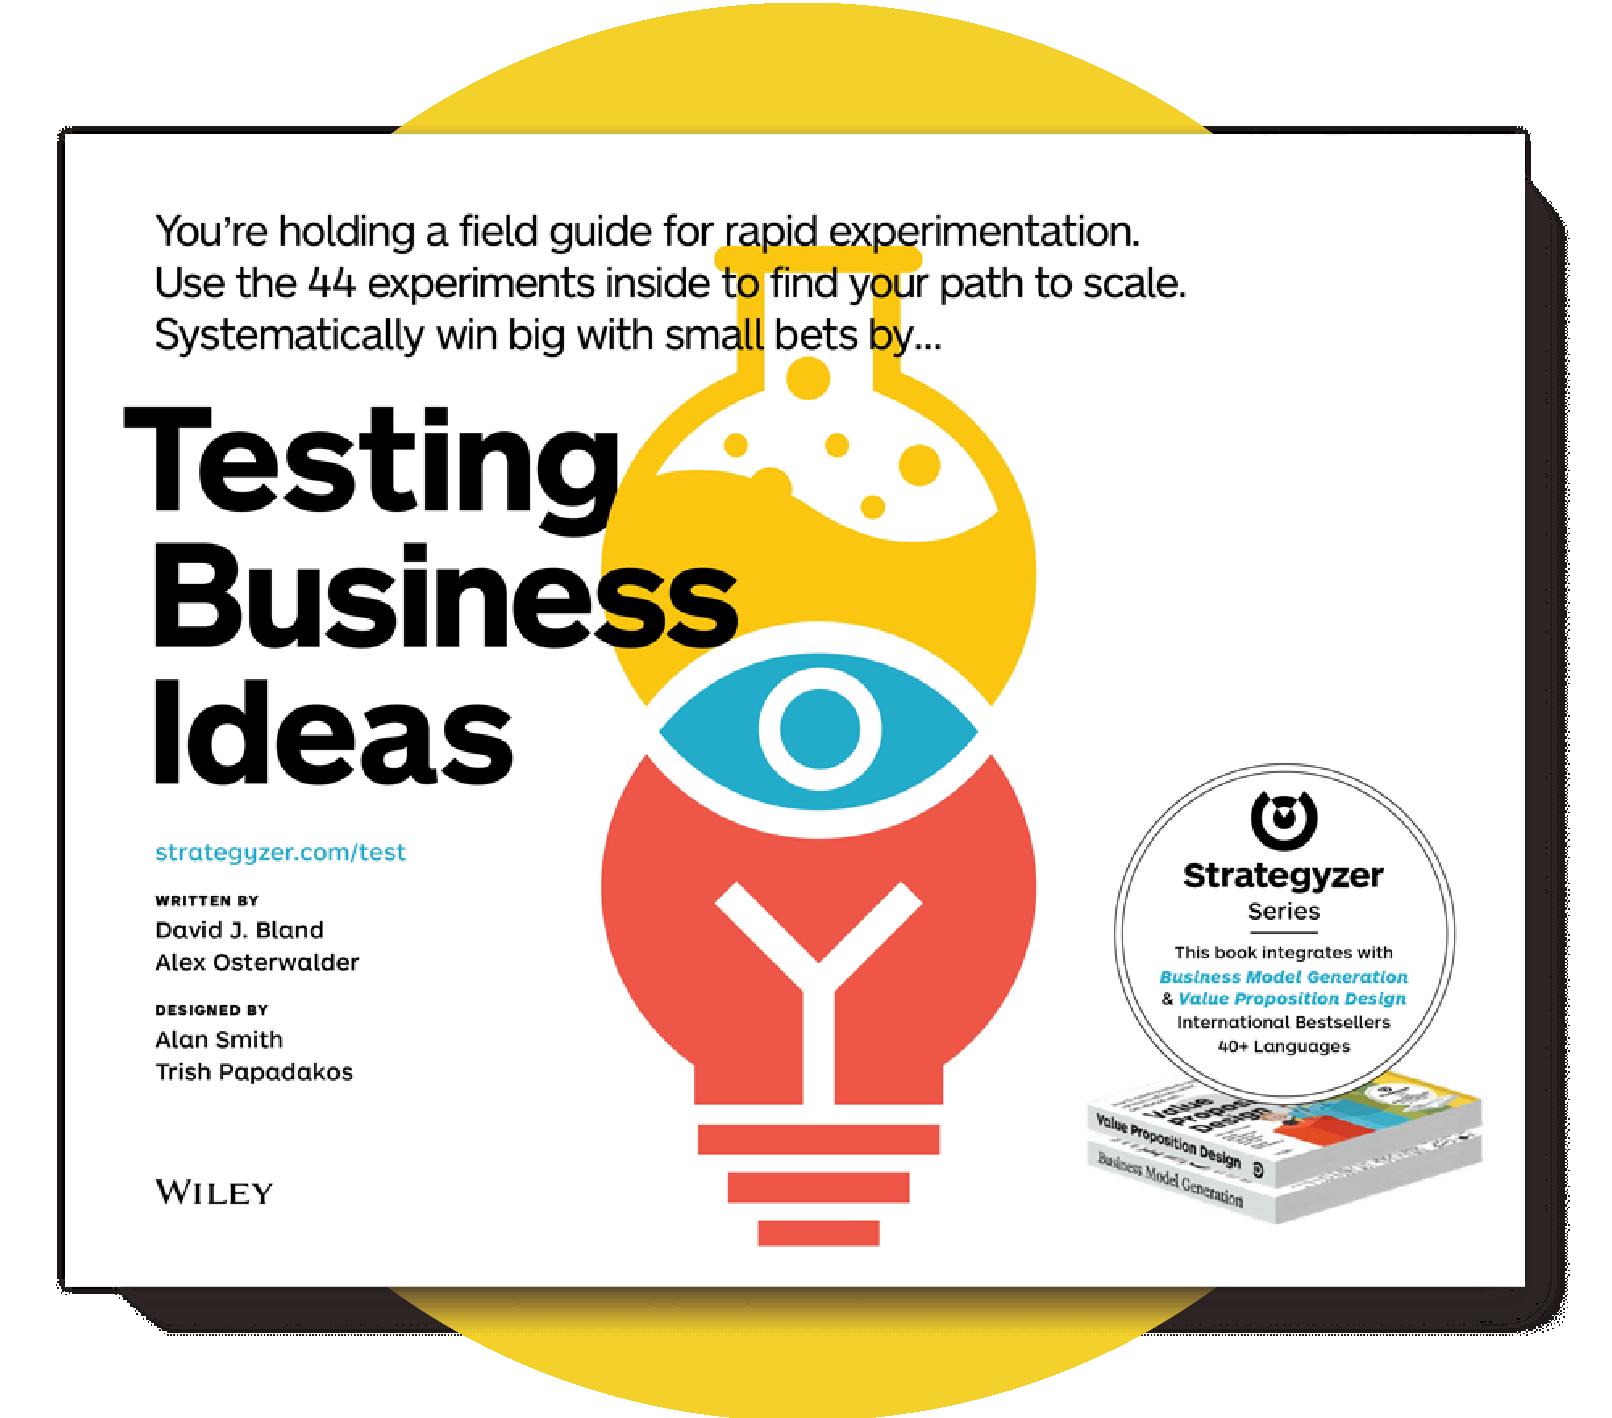 testing business ideas hero icon